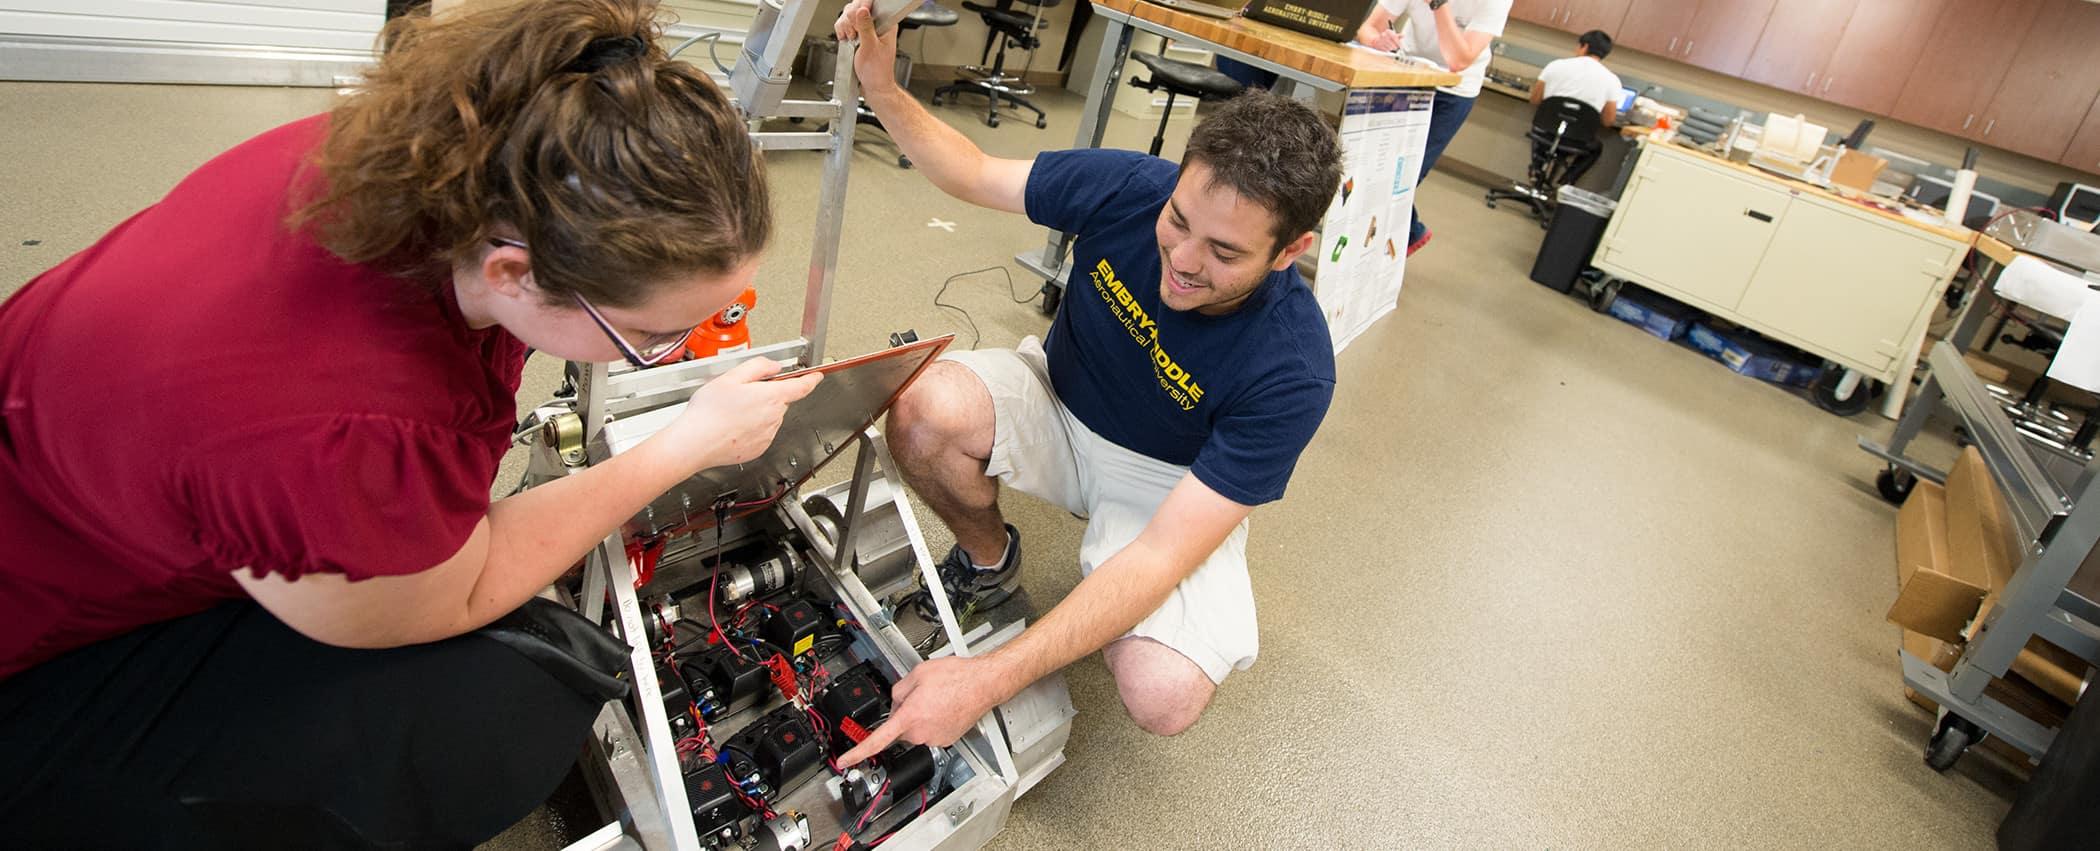 Aerospace Engineering Online Degree Programs 2017 2018